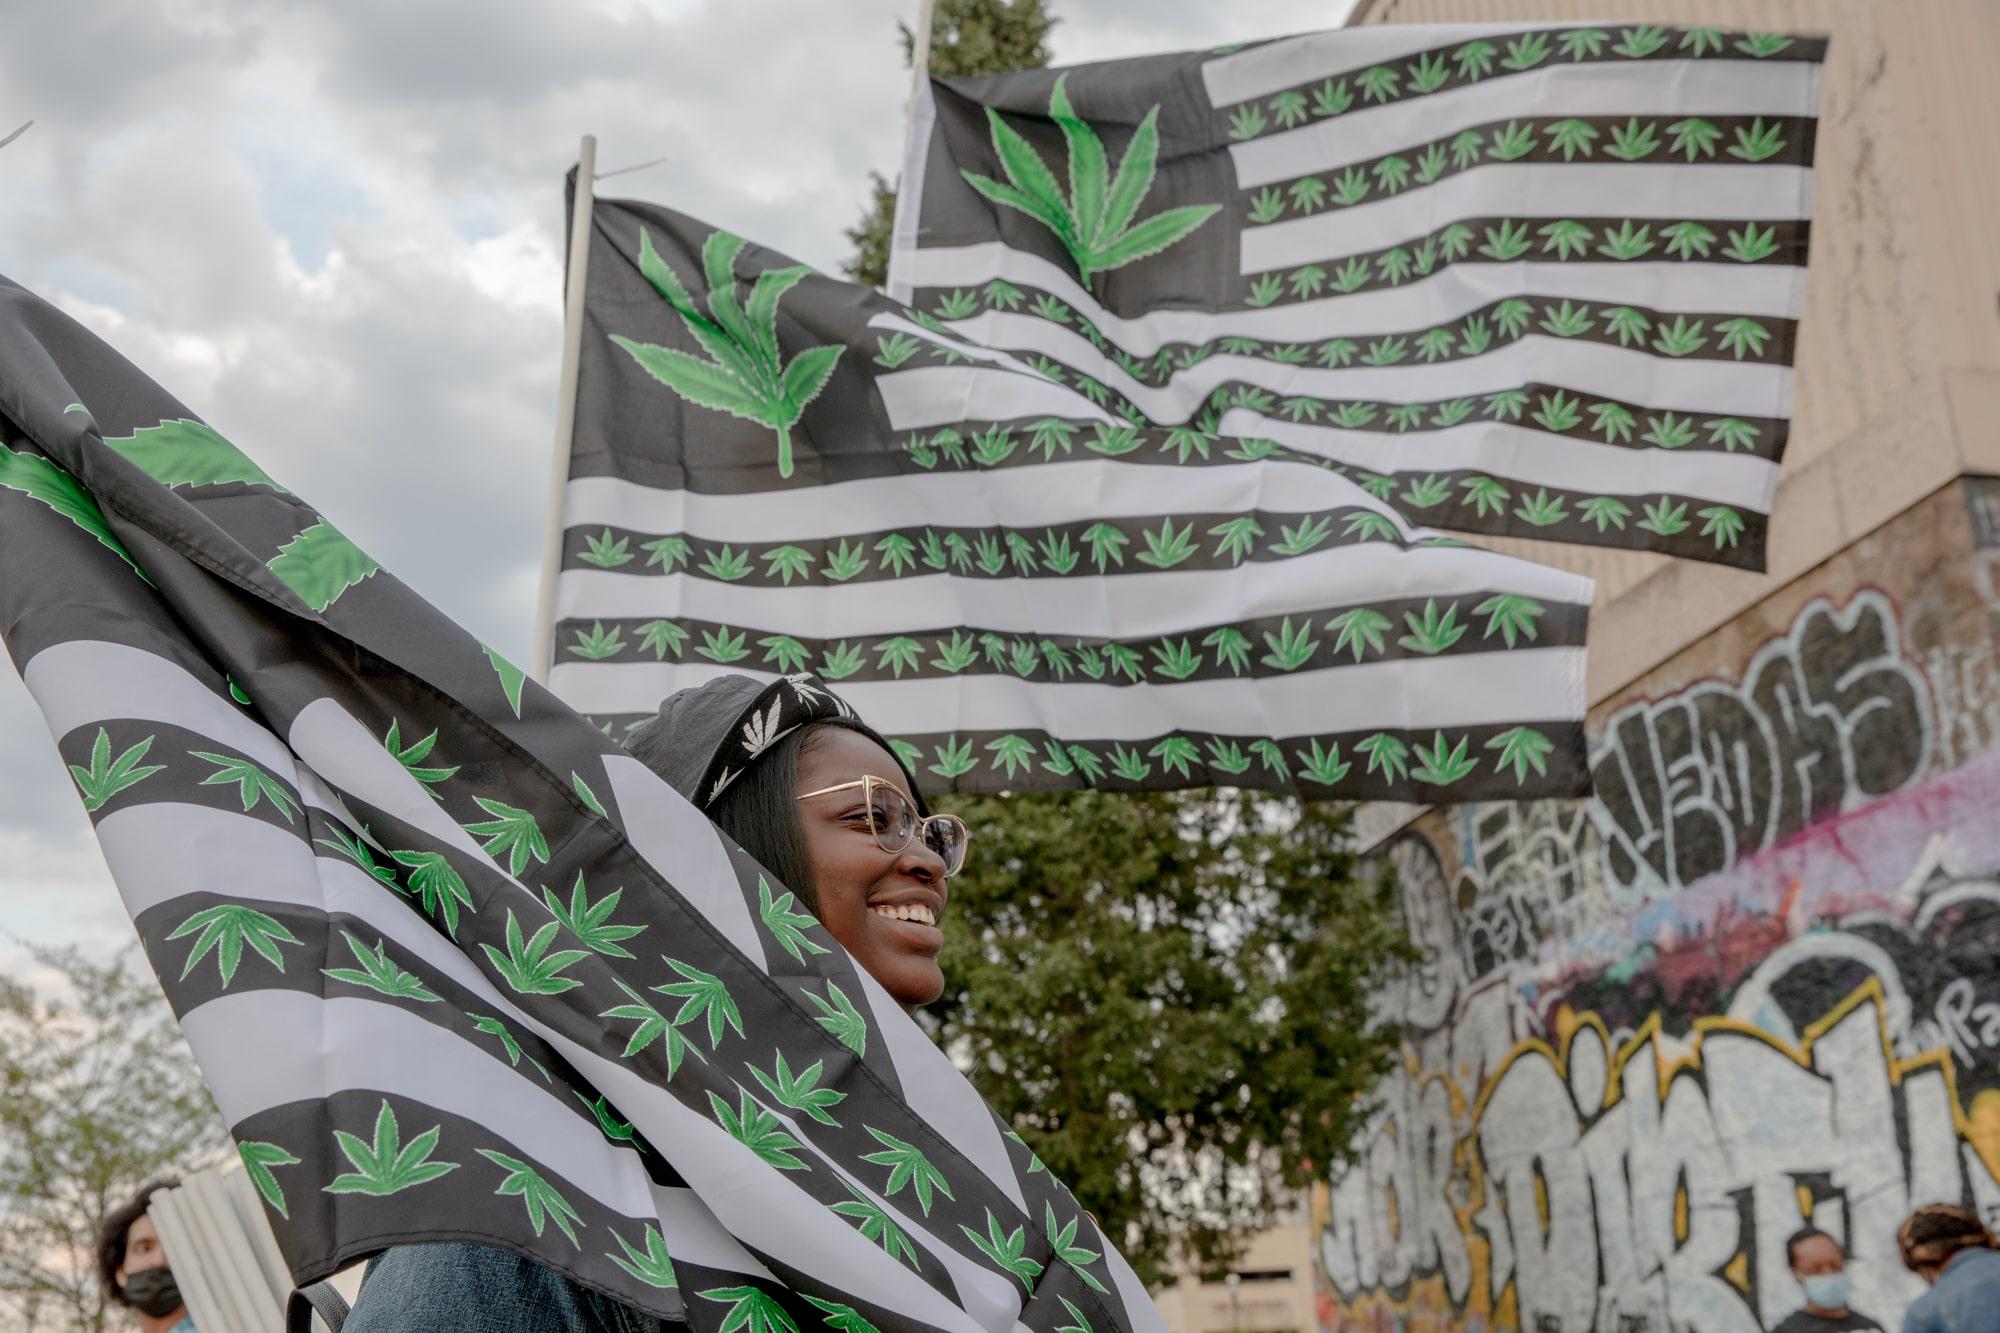 Legislators say CT marijuana bill favored one potential producer